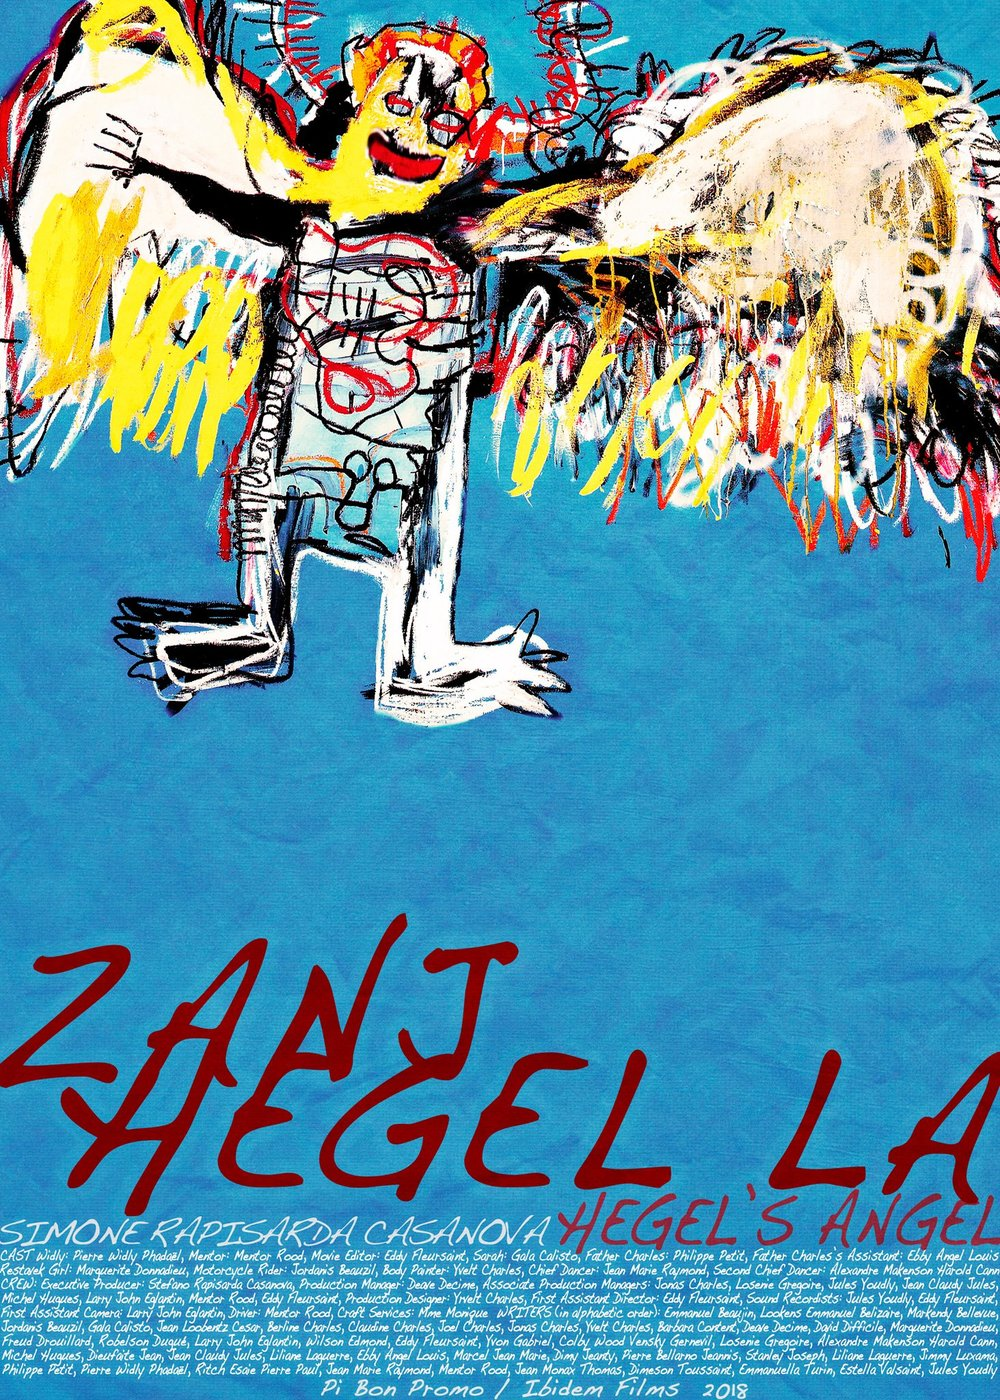 Zanj Hegal la , image via  The Cinematheque.